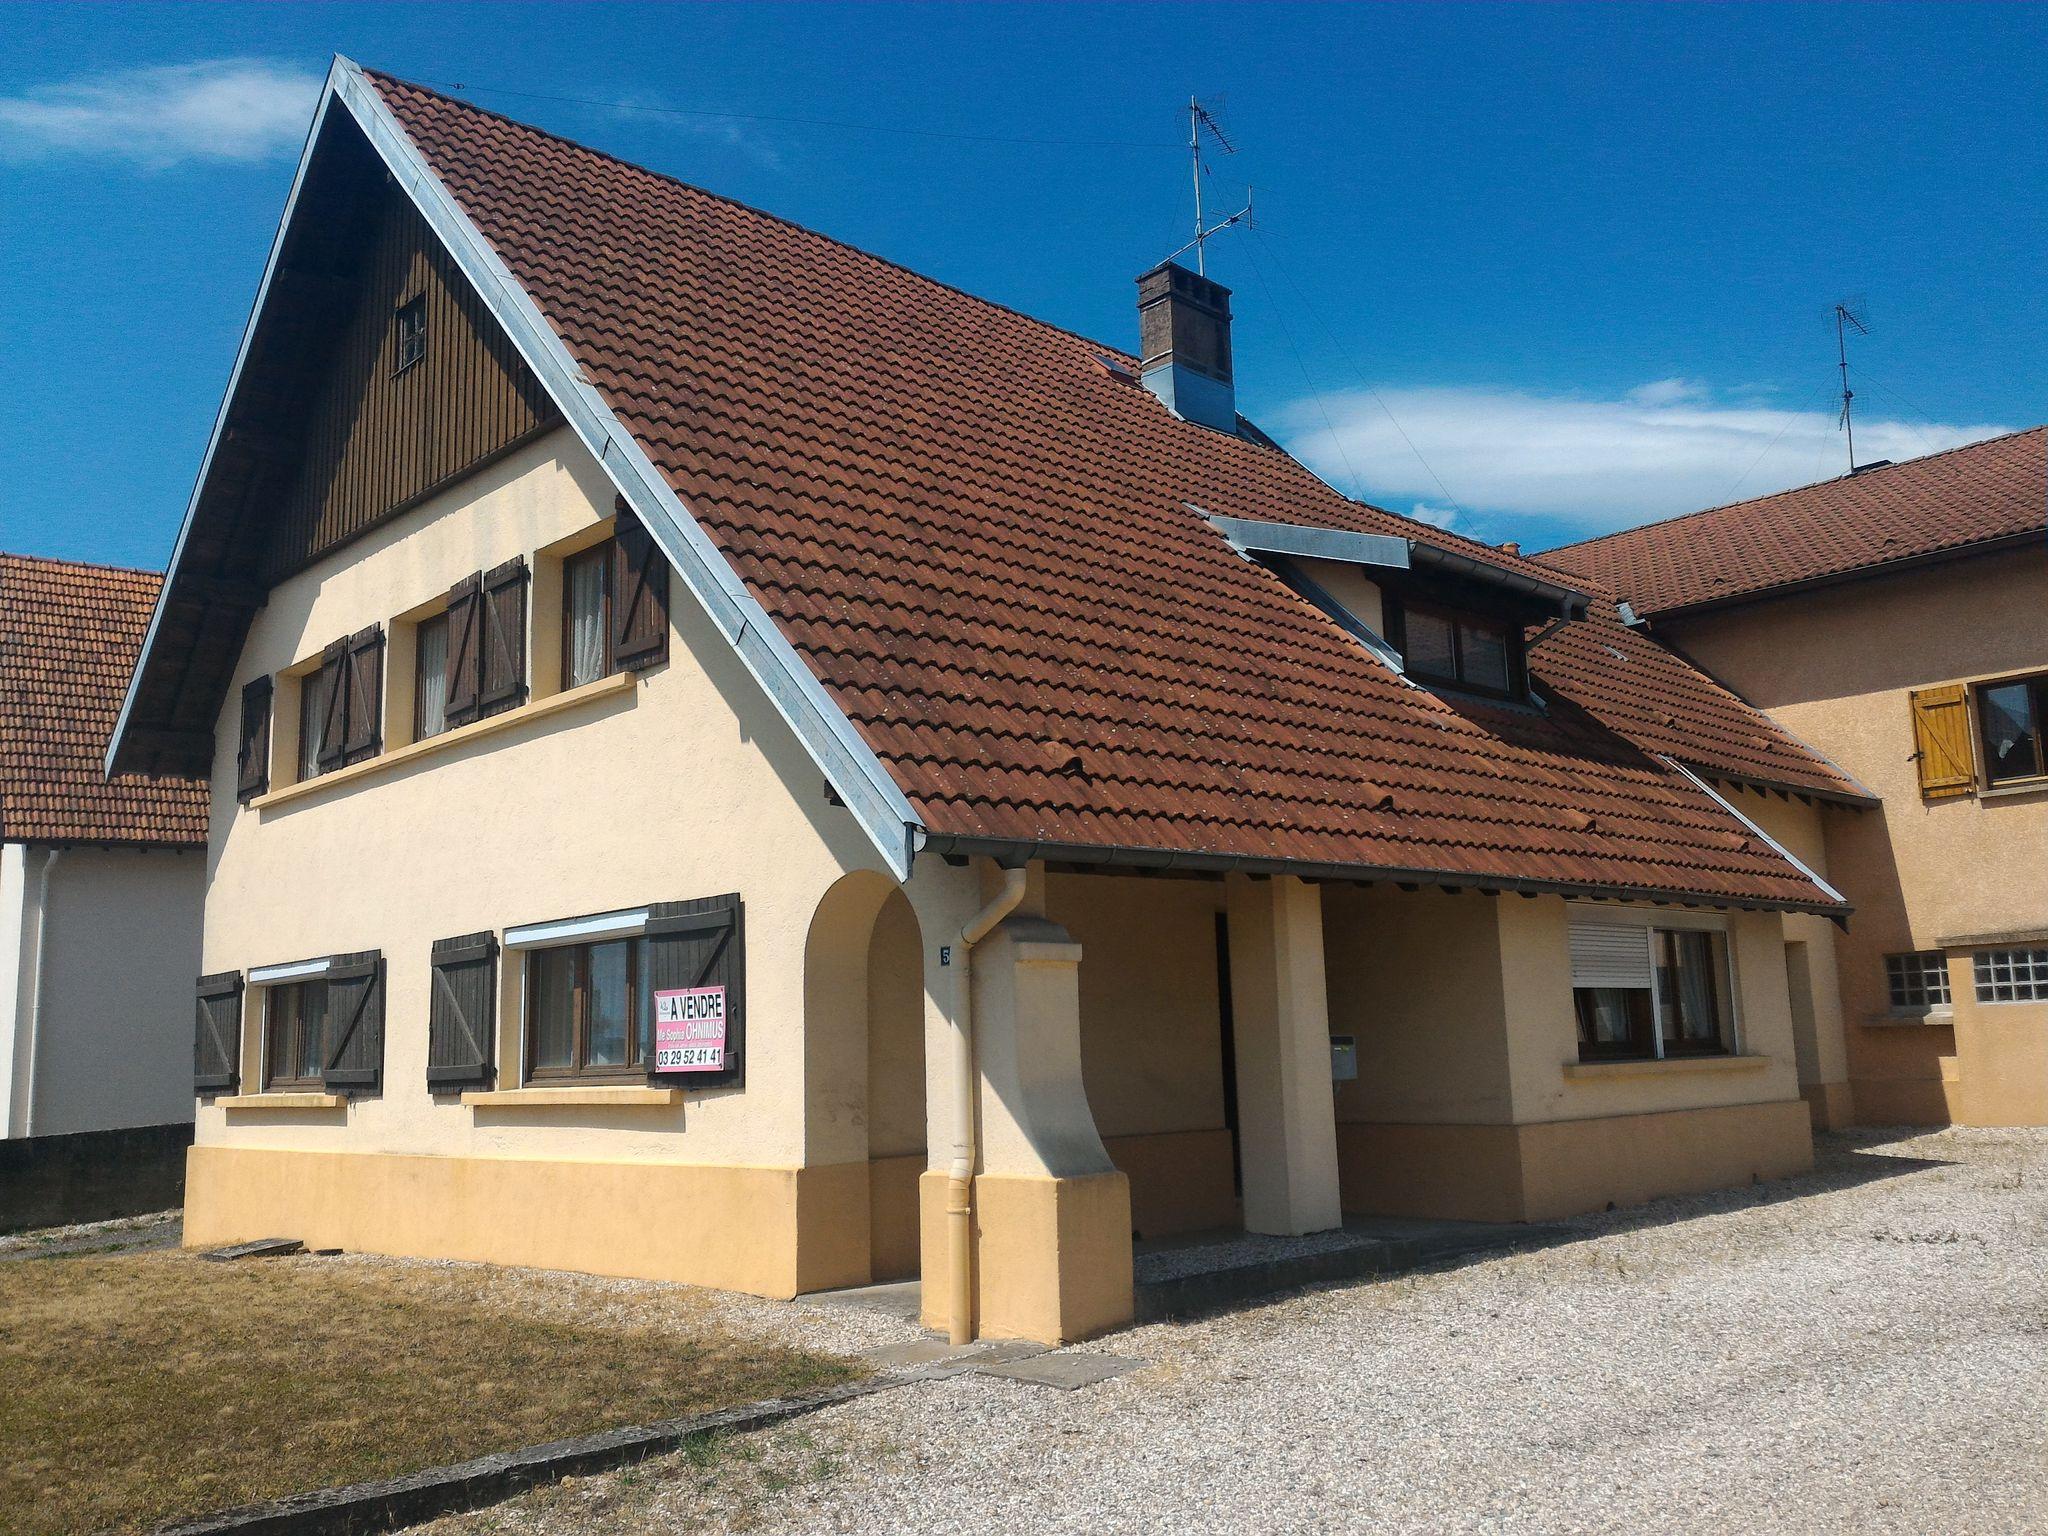 Achat Vente : Maison à acheter à rambervillers ()